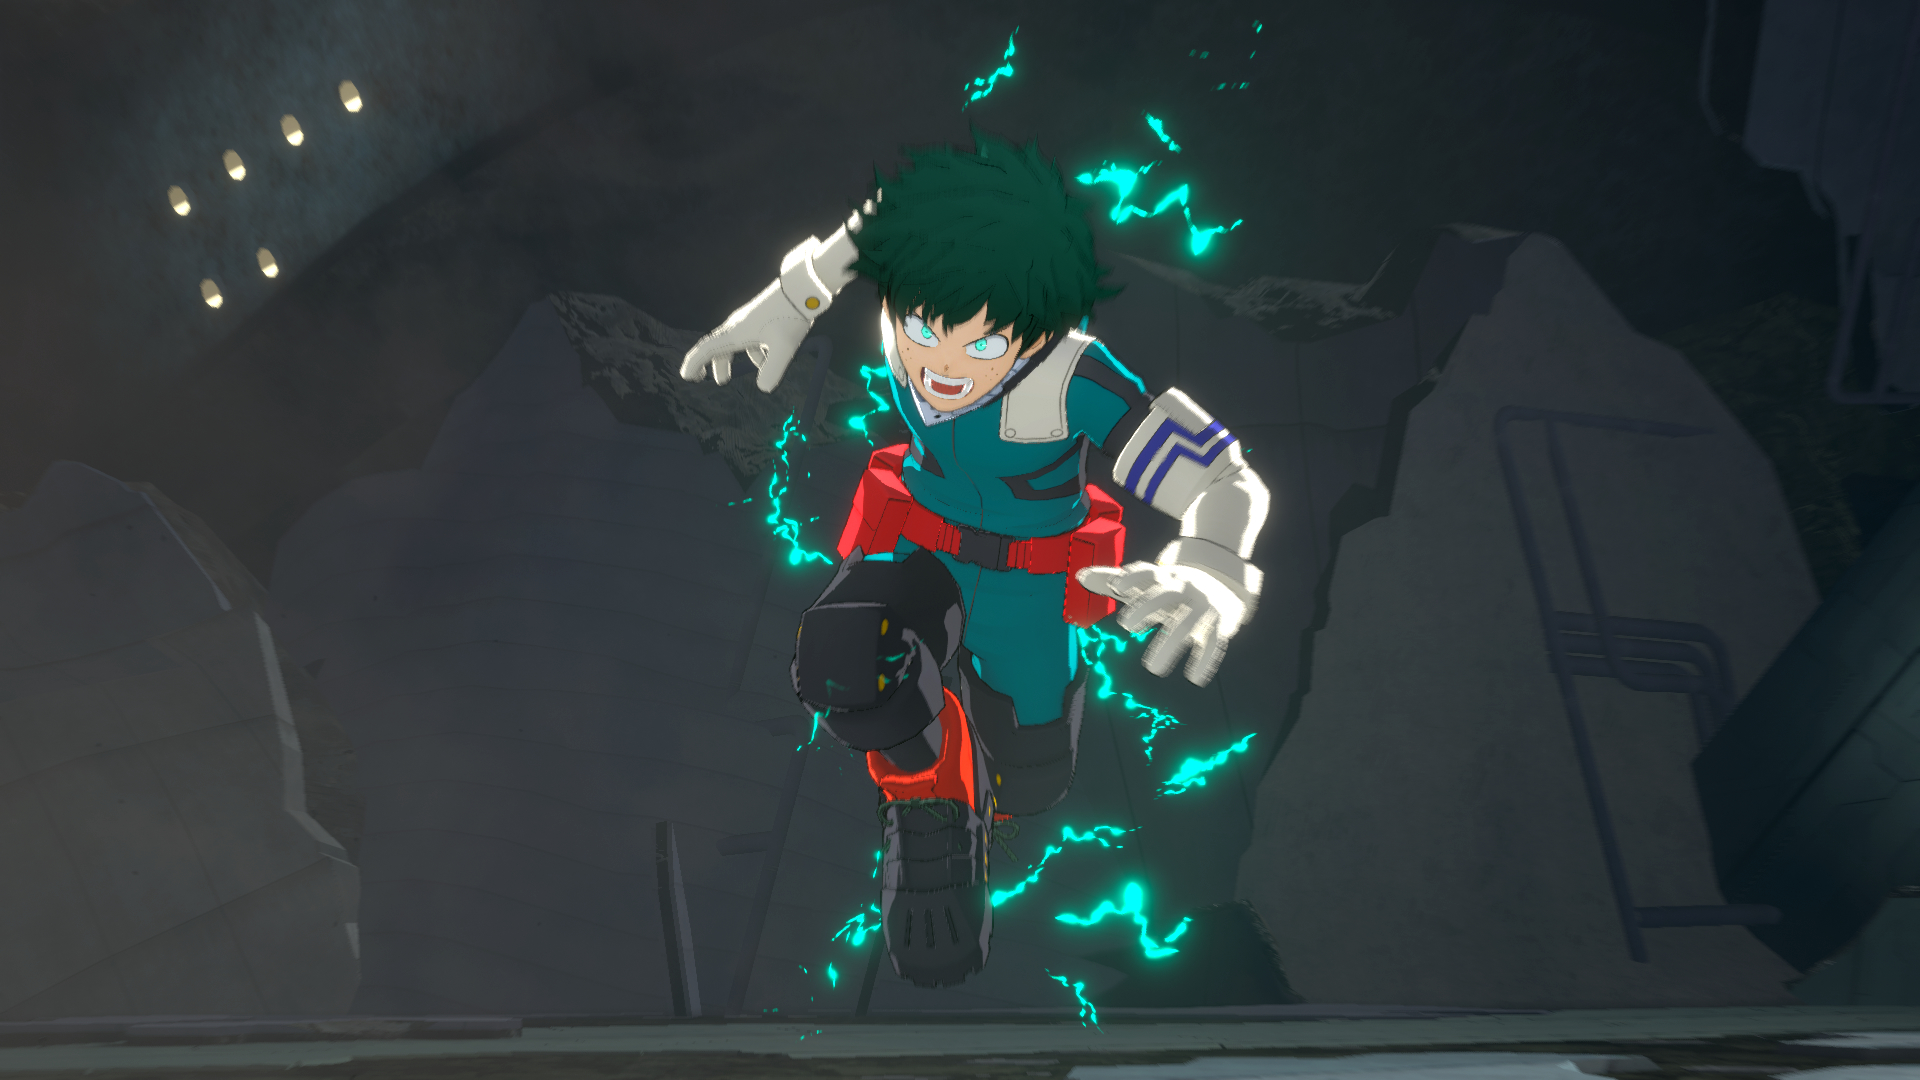 Izuku Midoriya In My Hero Ones Justice 2 Wallpaper Hd Games